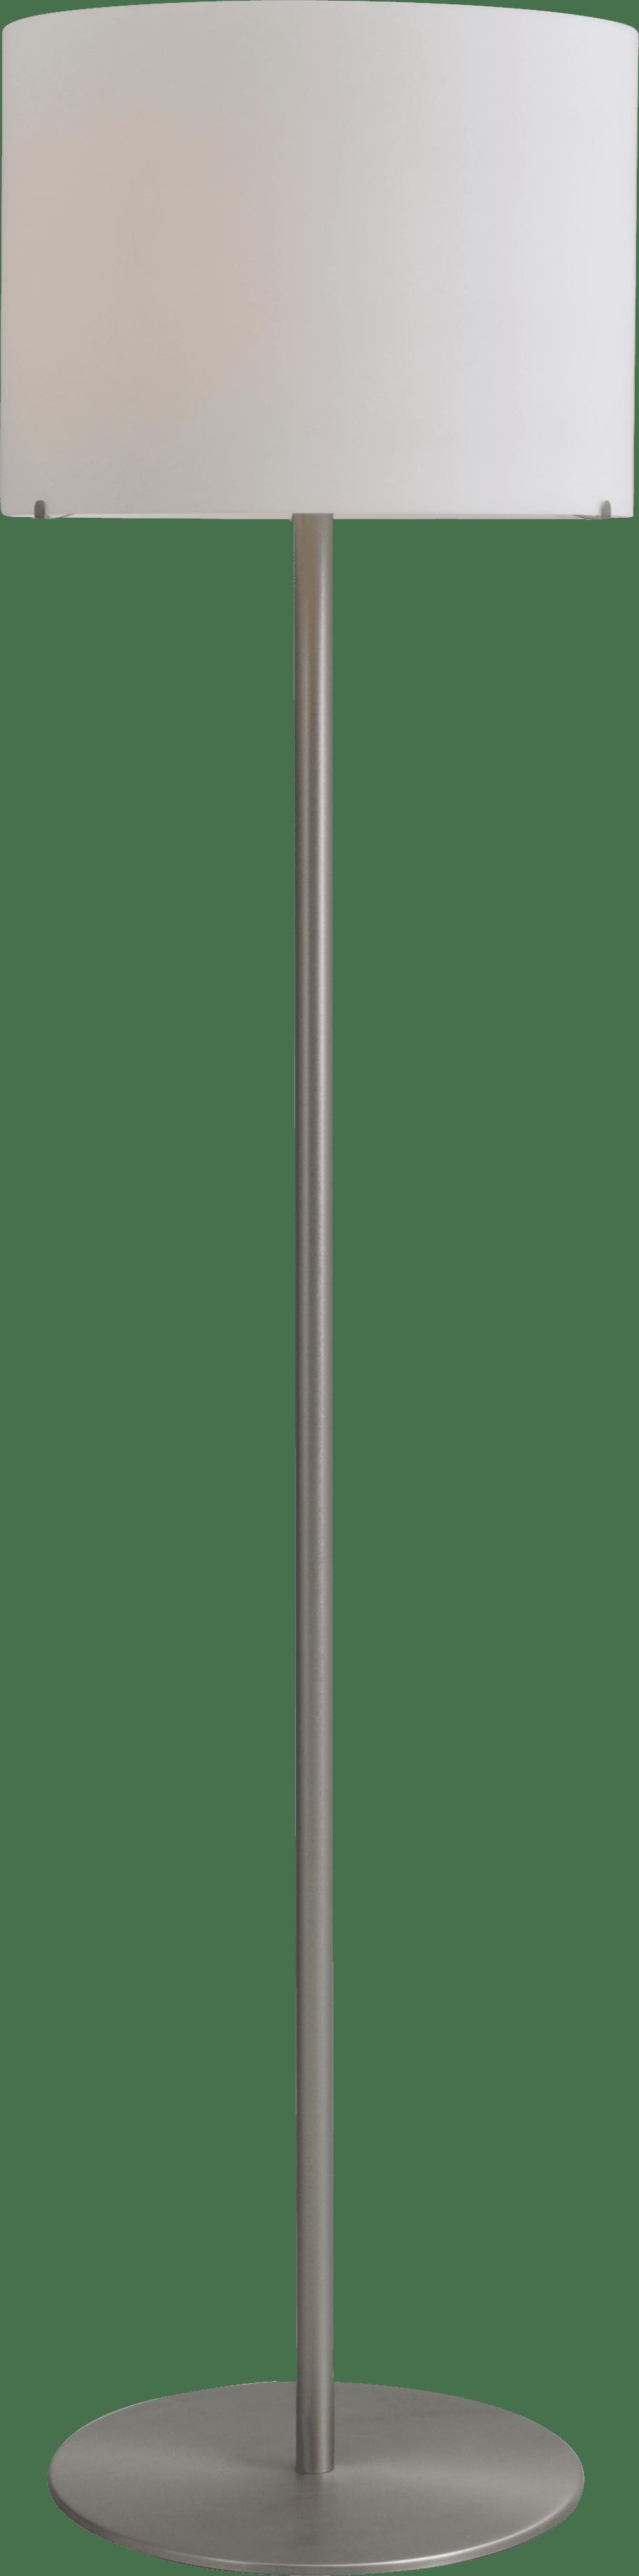 Cilindra VL CILINDRA NIKKEL H.159CM GL.35/35/30